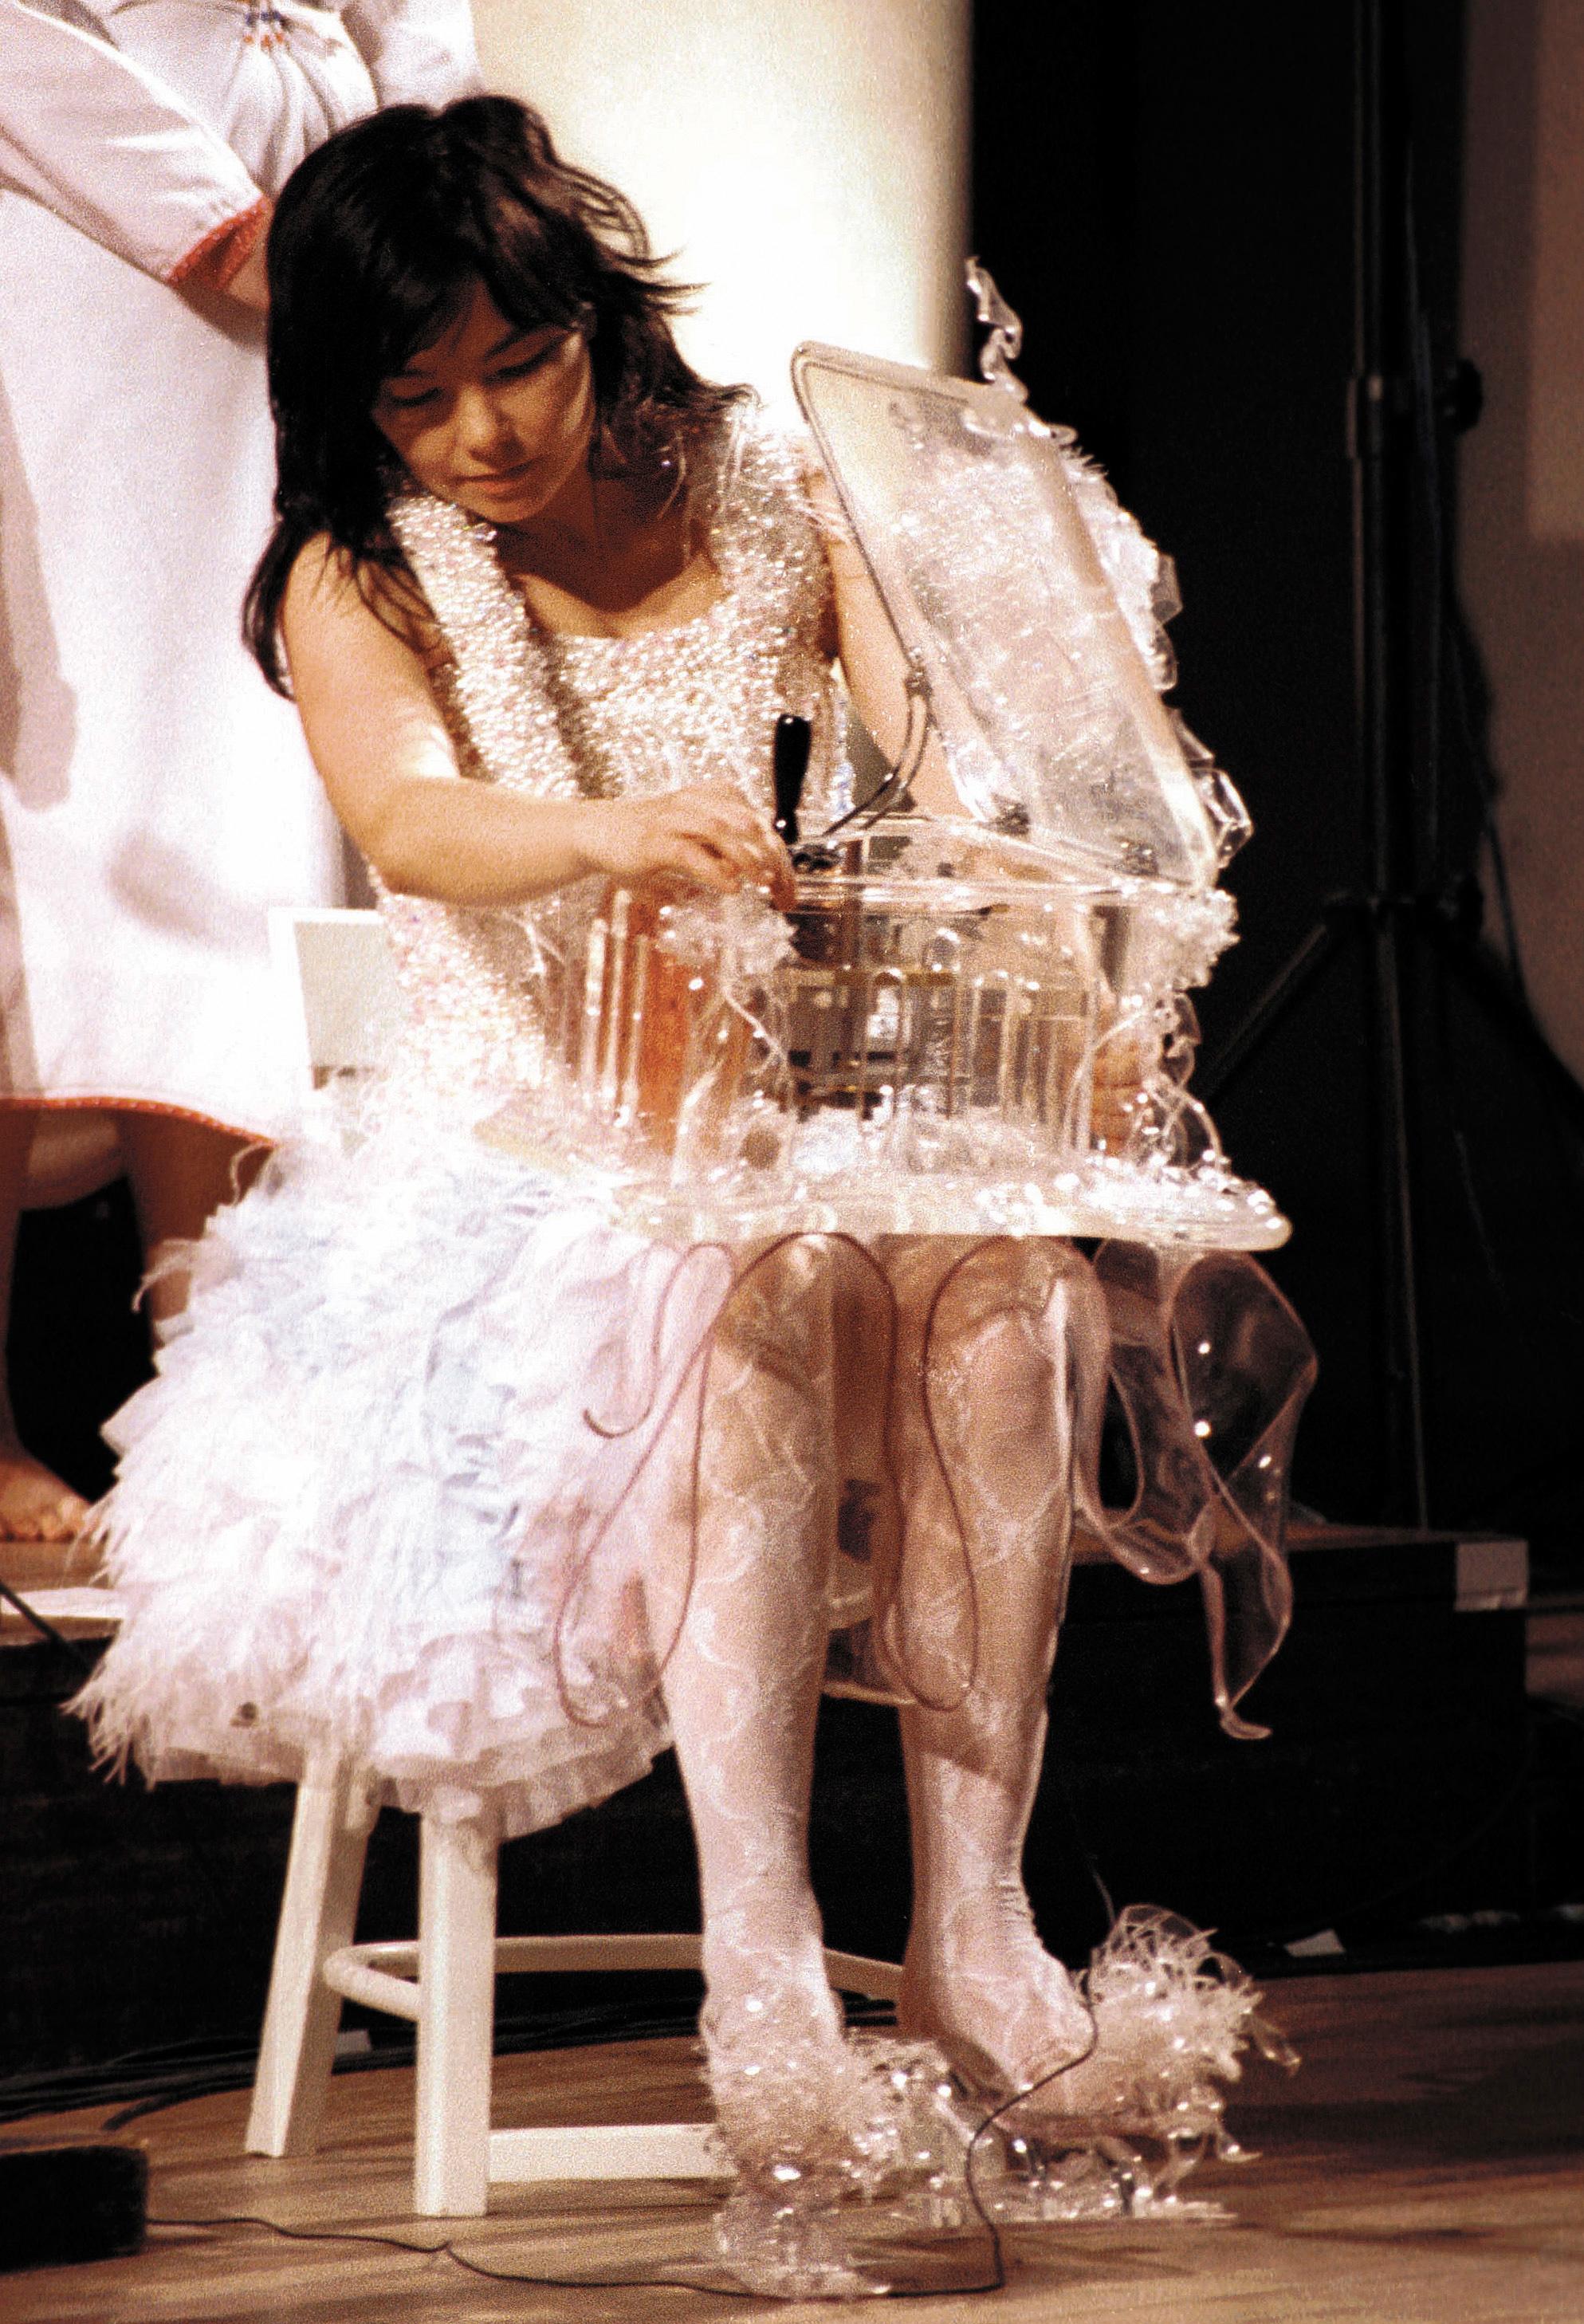 Björk performs at St. John's Church in London on Aug. 29, 2001.